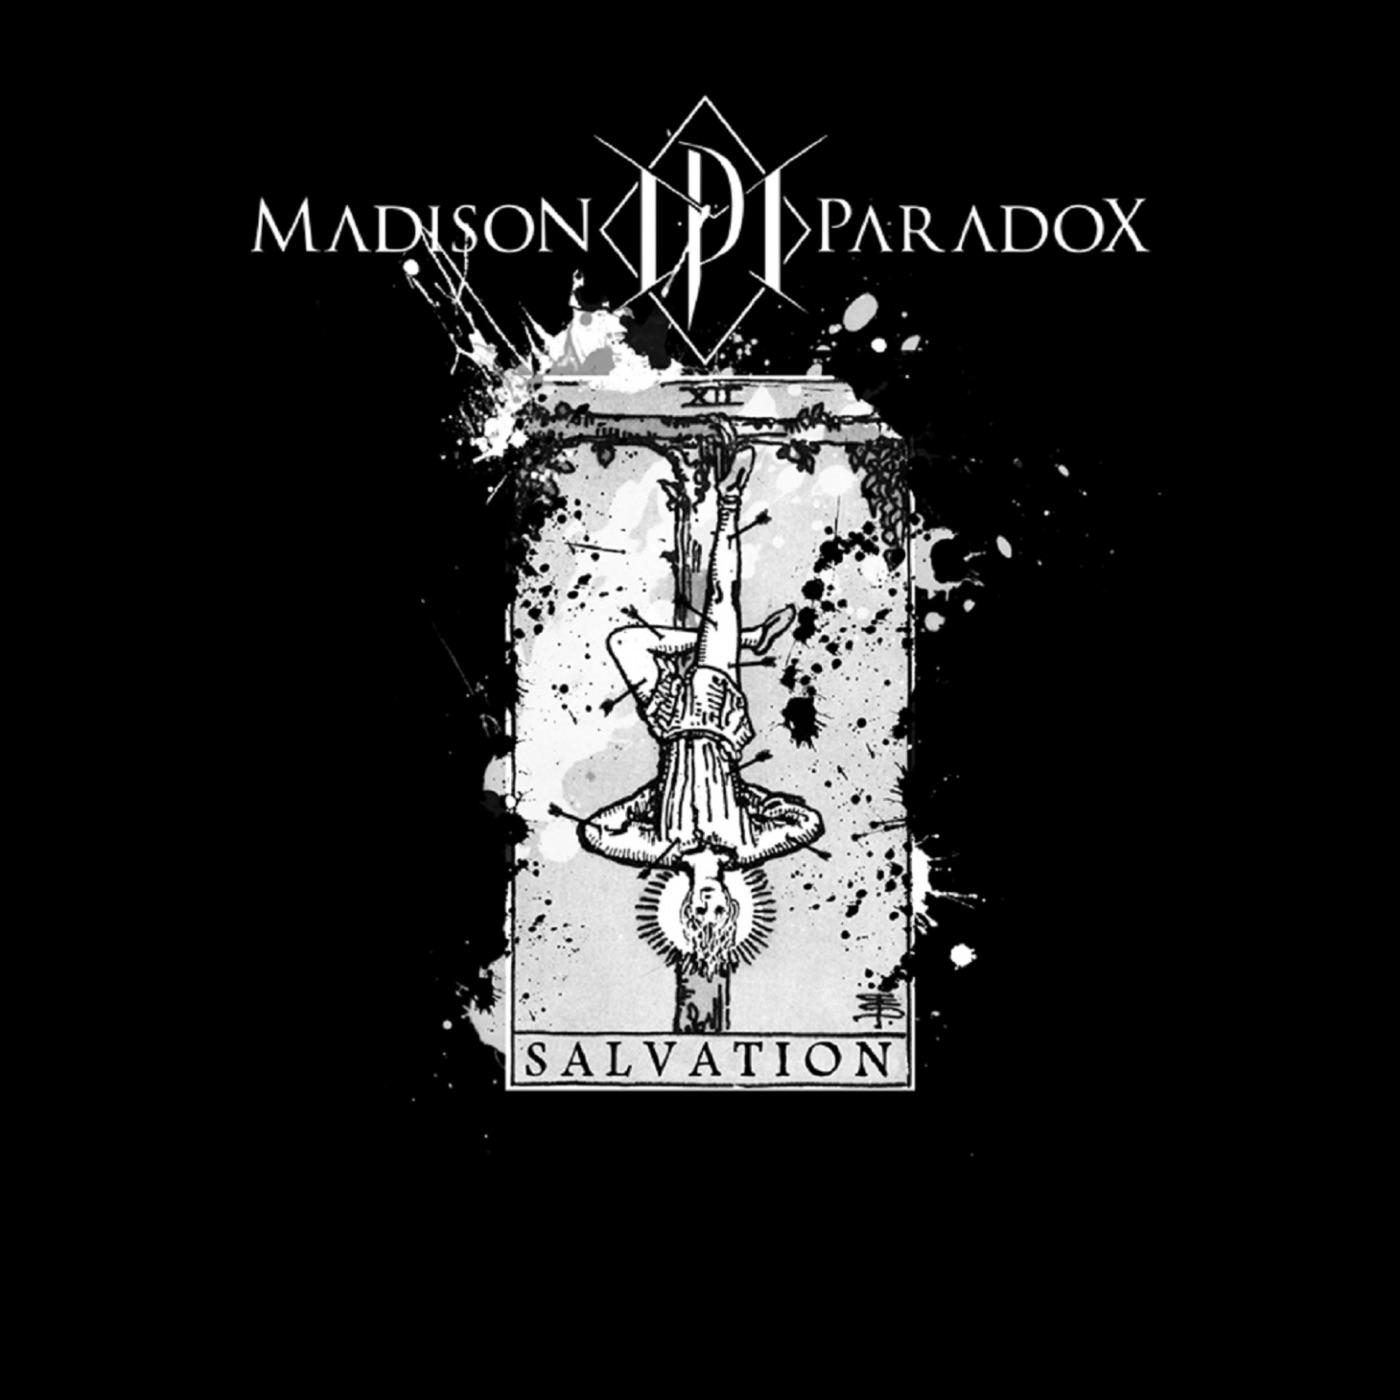 Madison Paradox - Salvation [single] (2018)